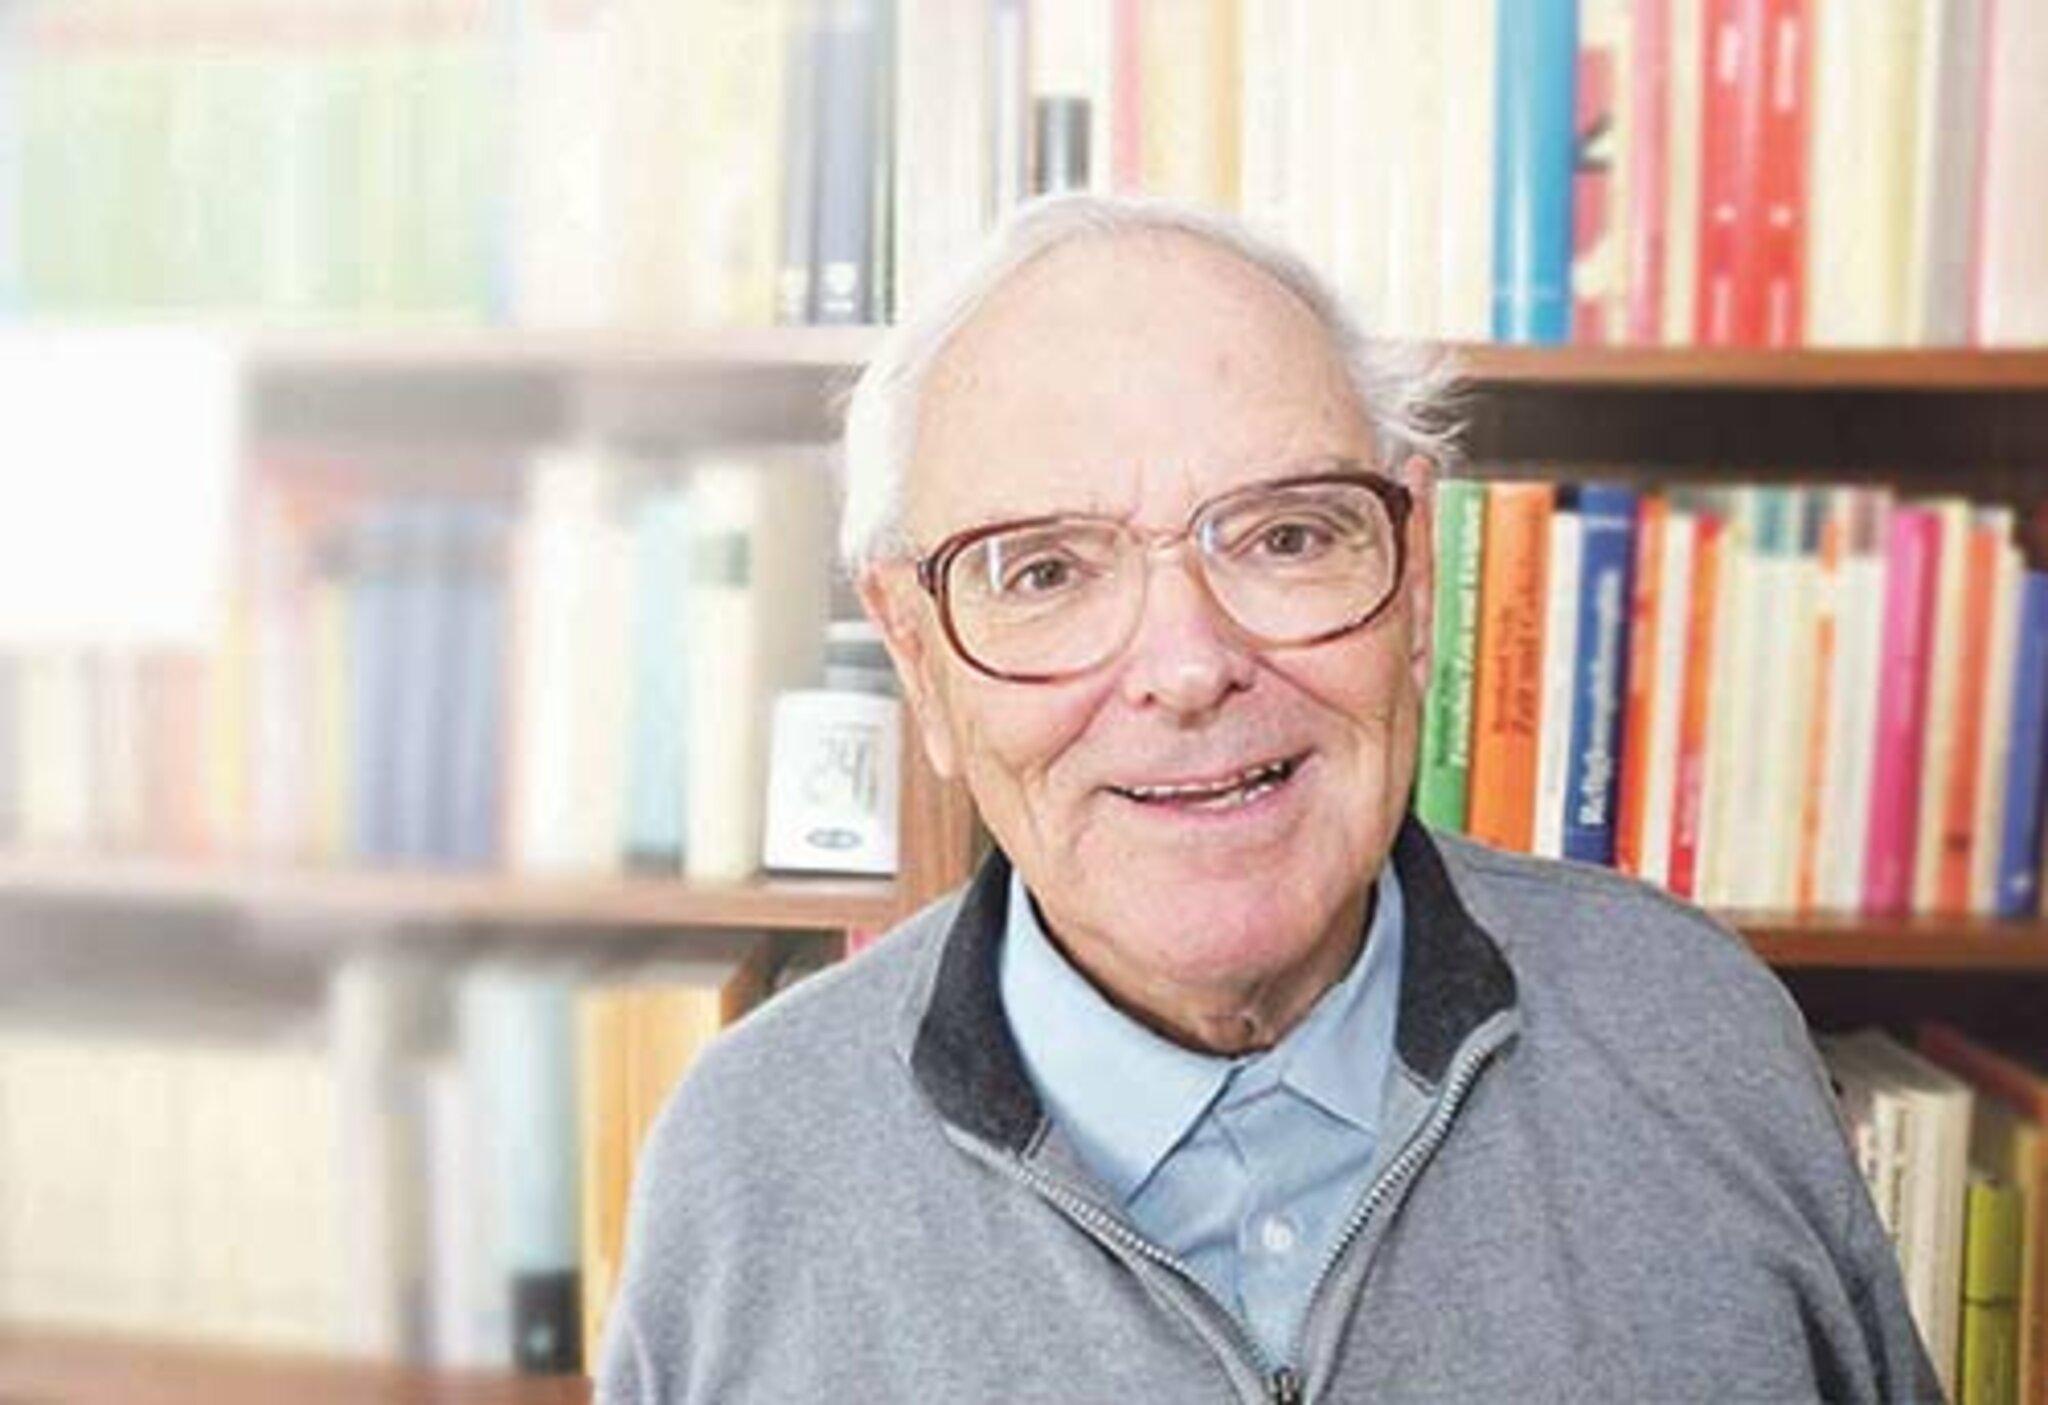 Universitätsprofessor Gisbert Greshake